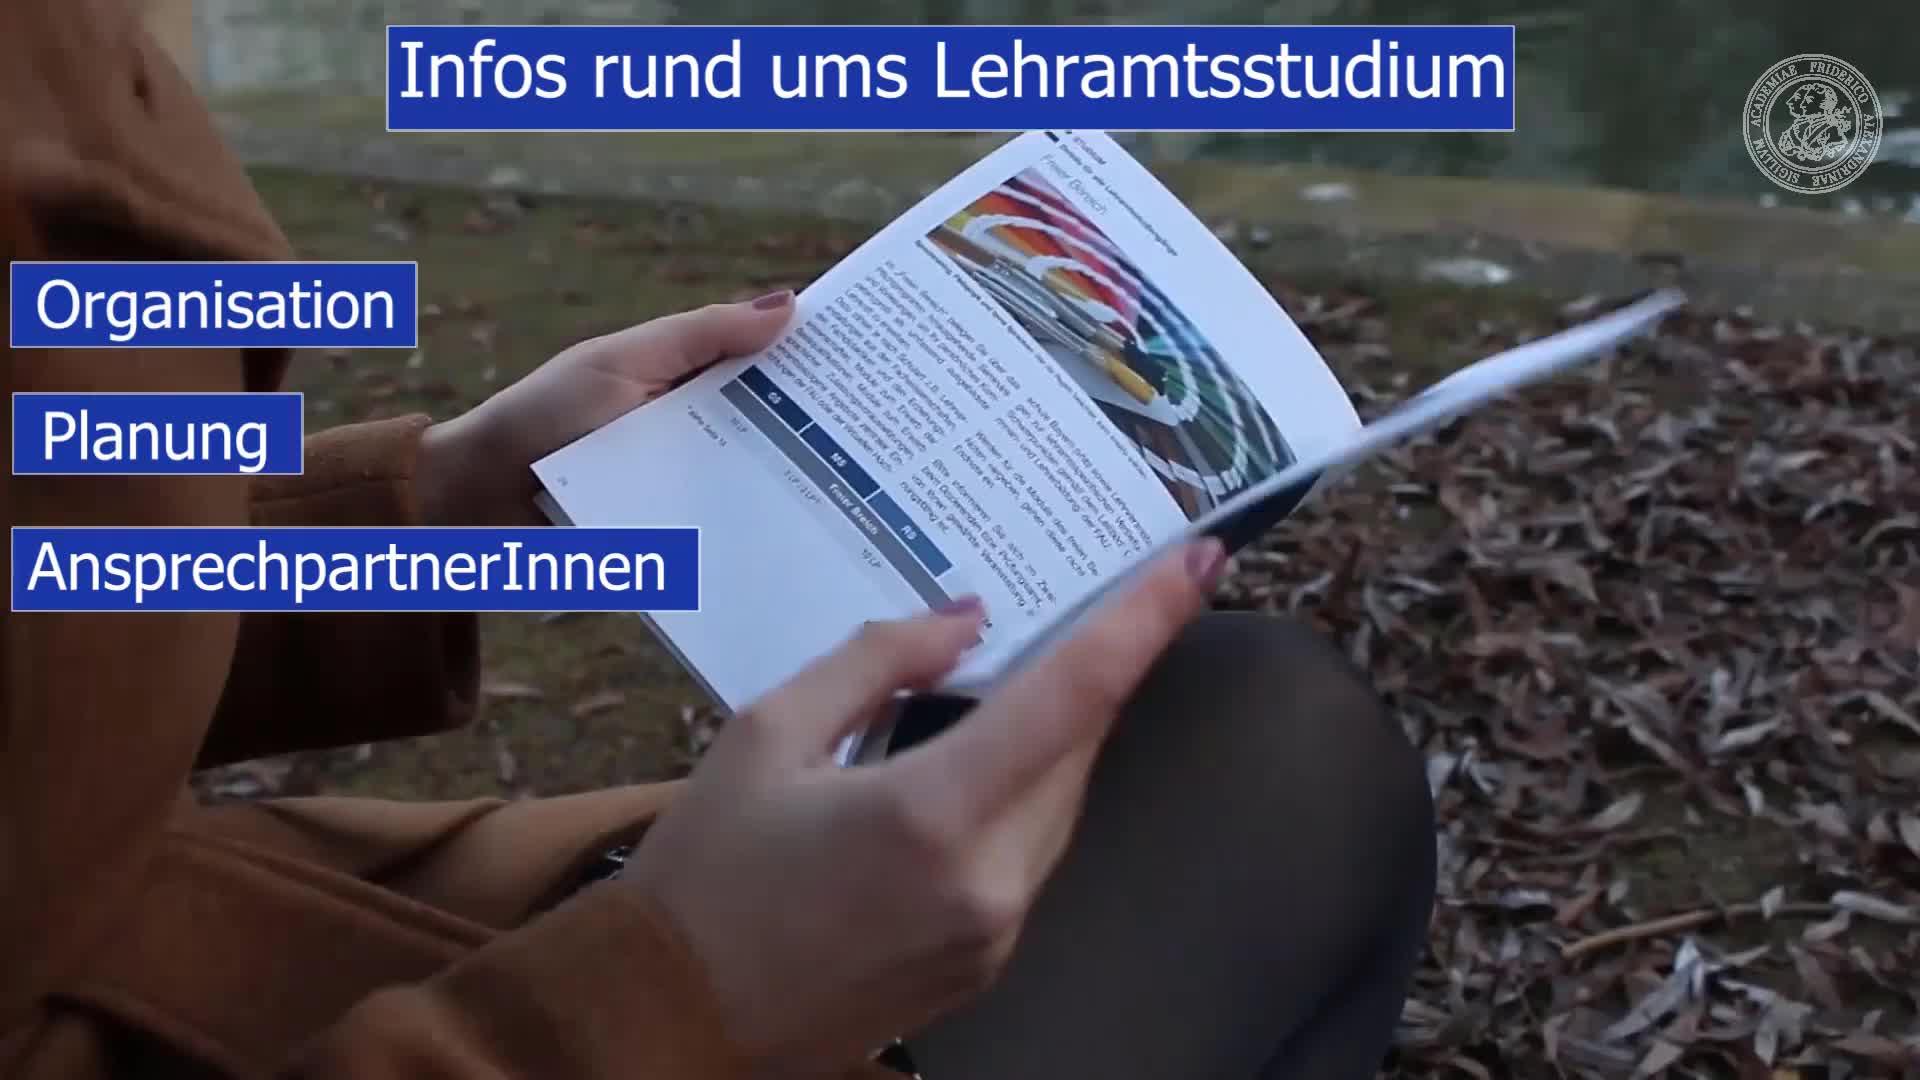 Lehramt | Gymnasium | Realschule | Stundenplan I | ZfL preview image